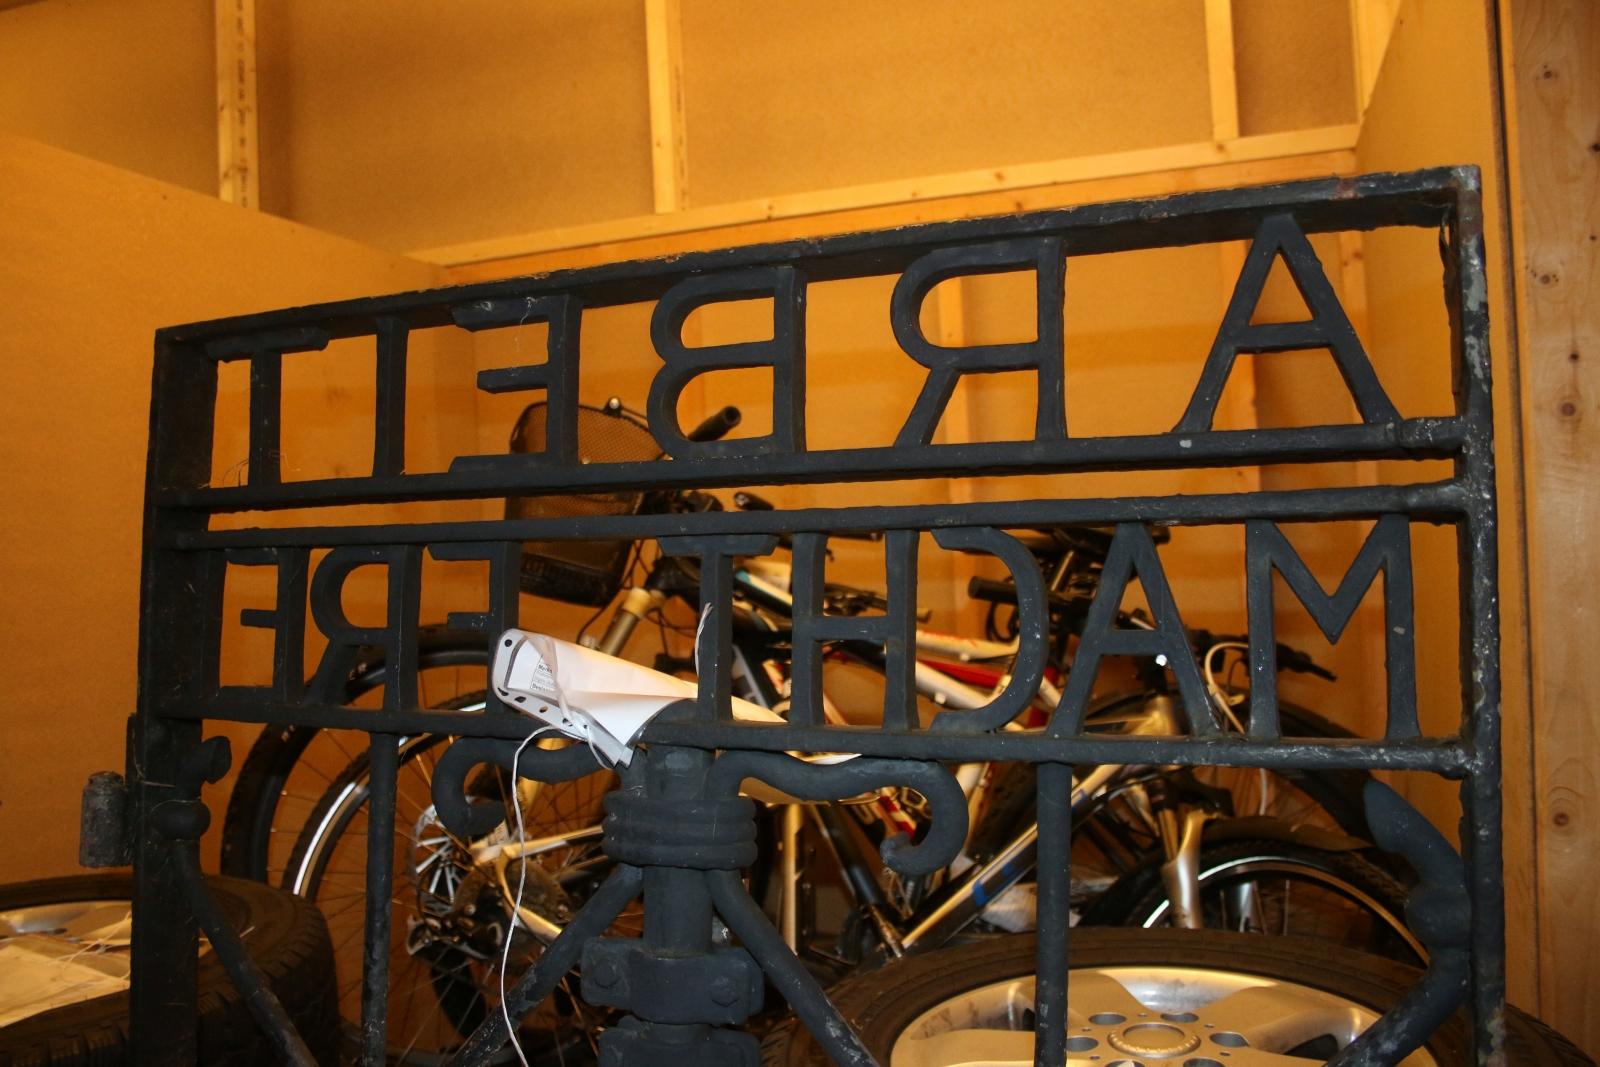 Dachau concentration camp gate